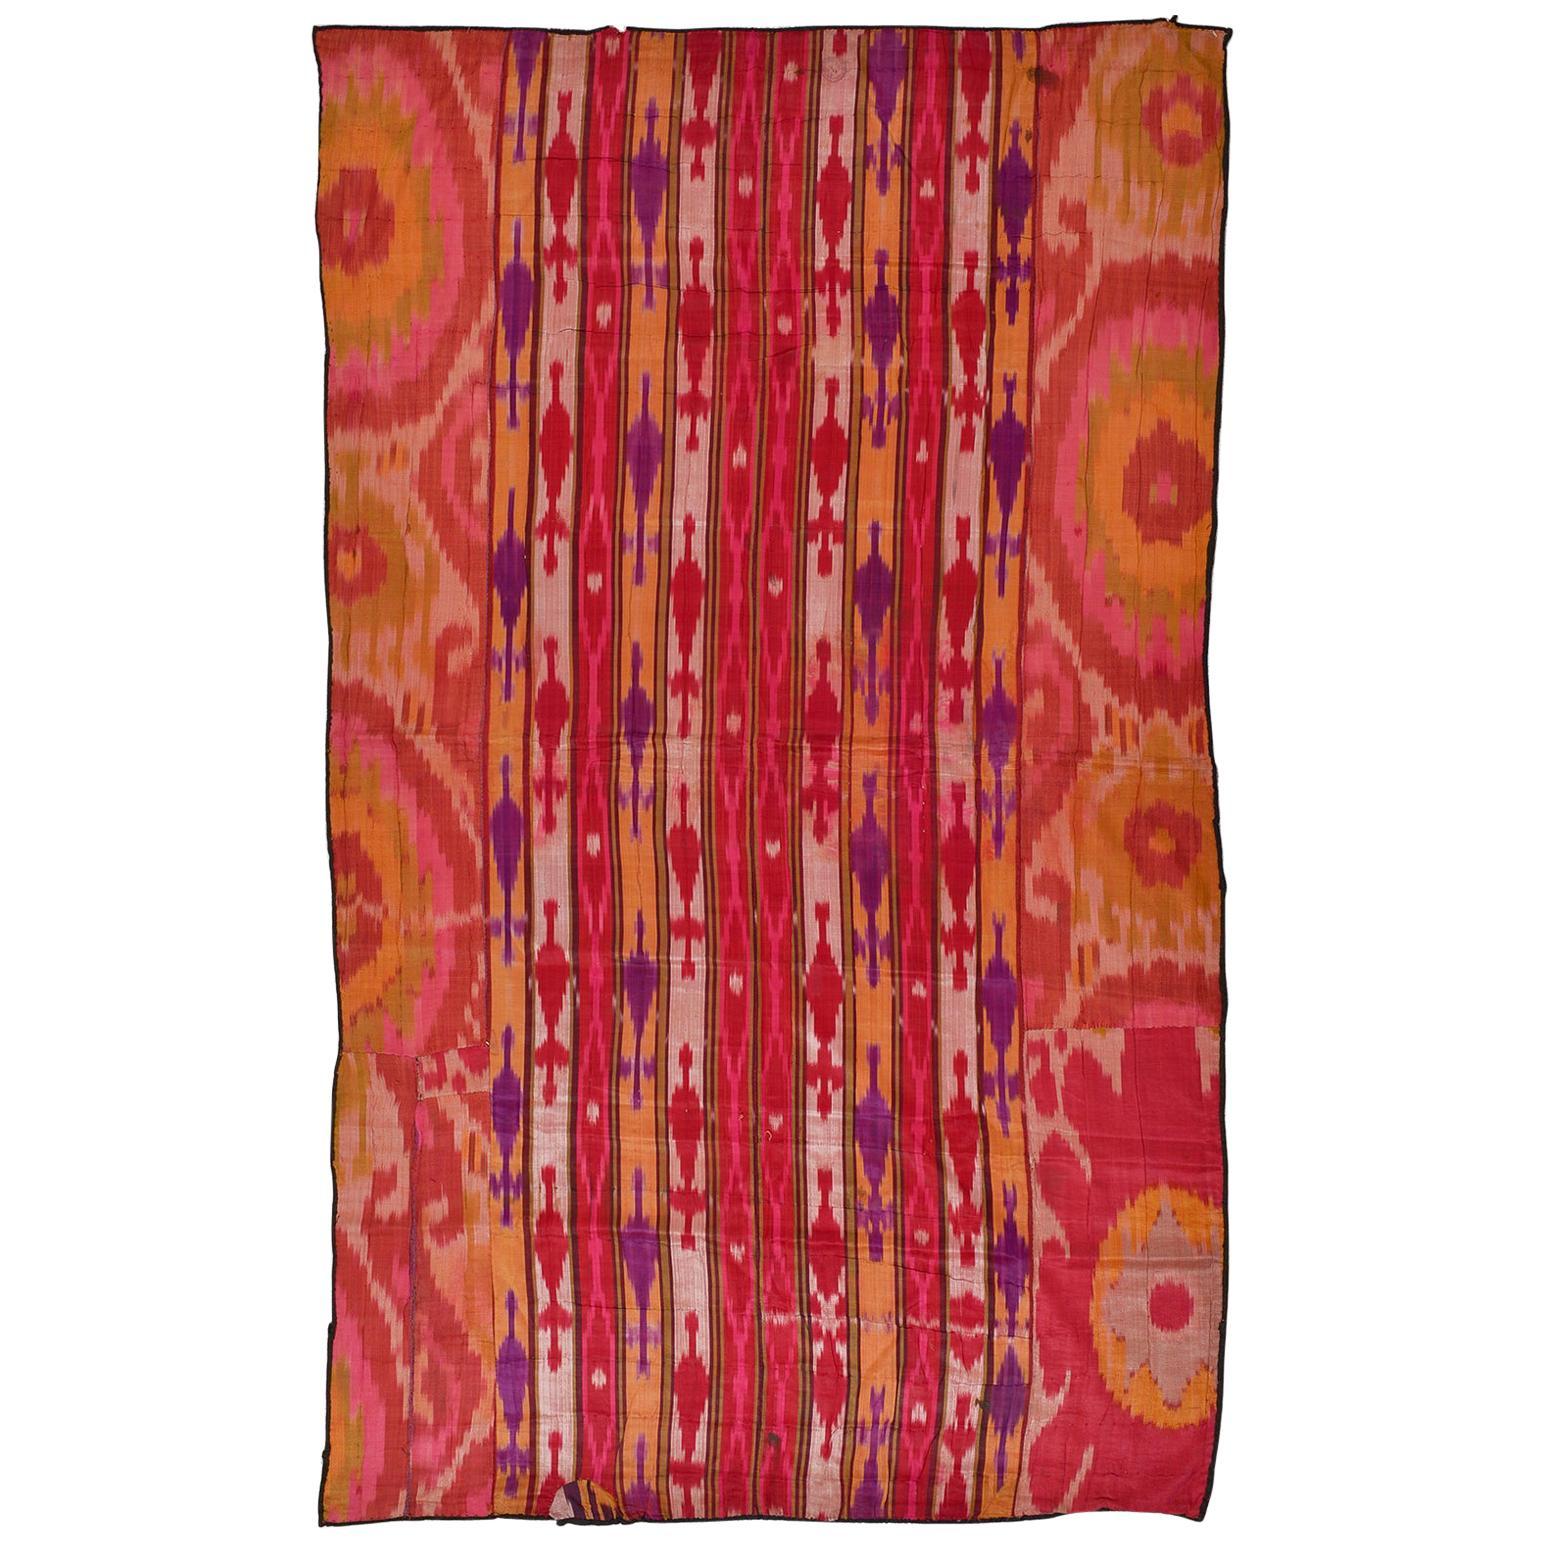 Antique Silk Bokara Ikat Textile